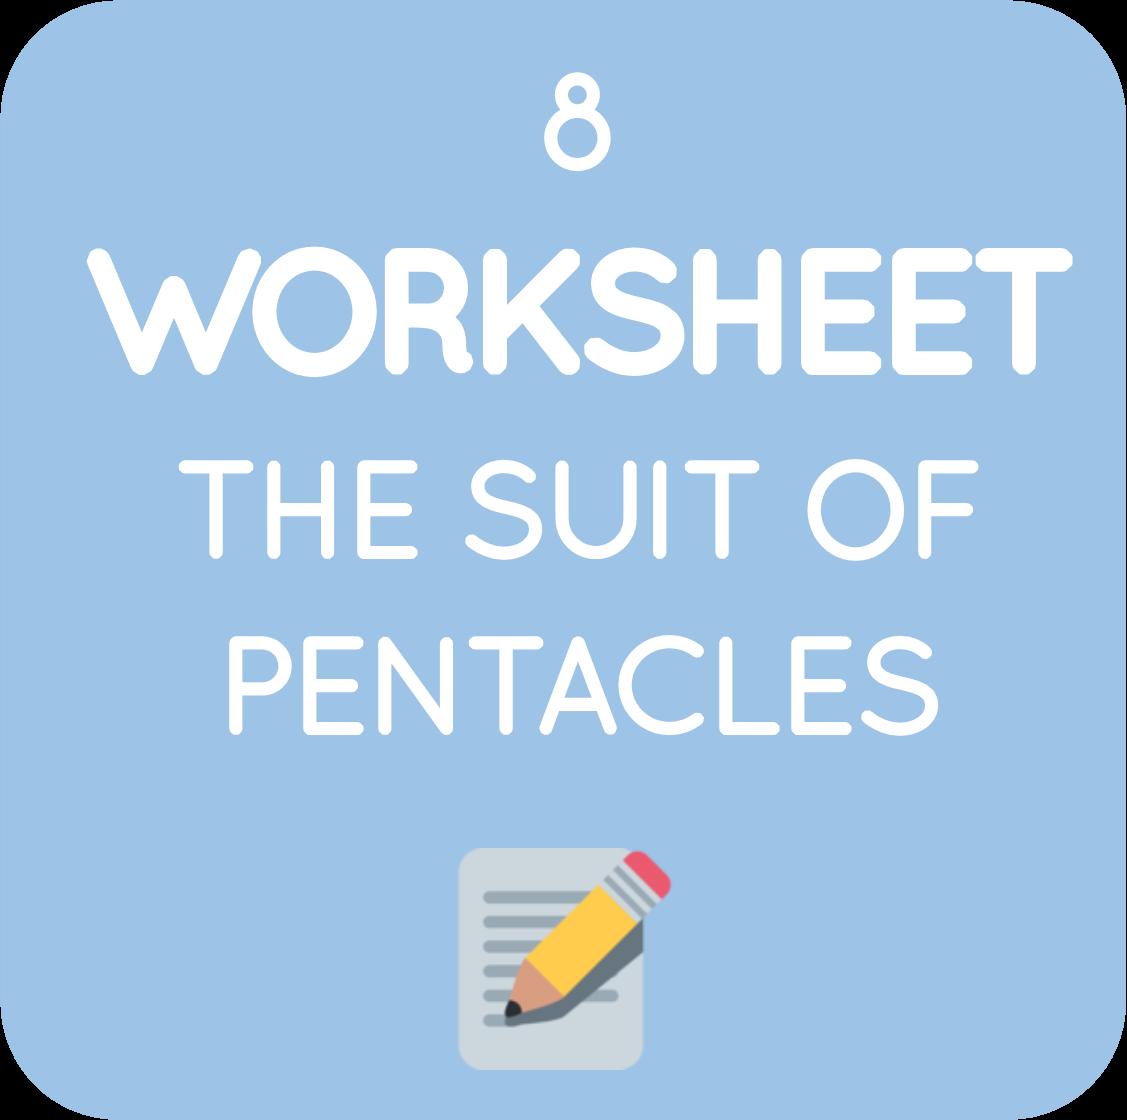 14-tarot worksheet #8.png